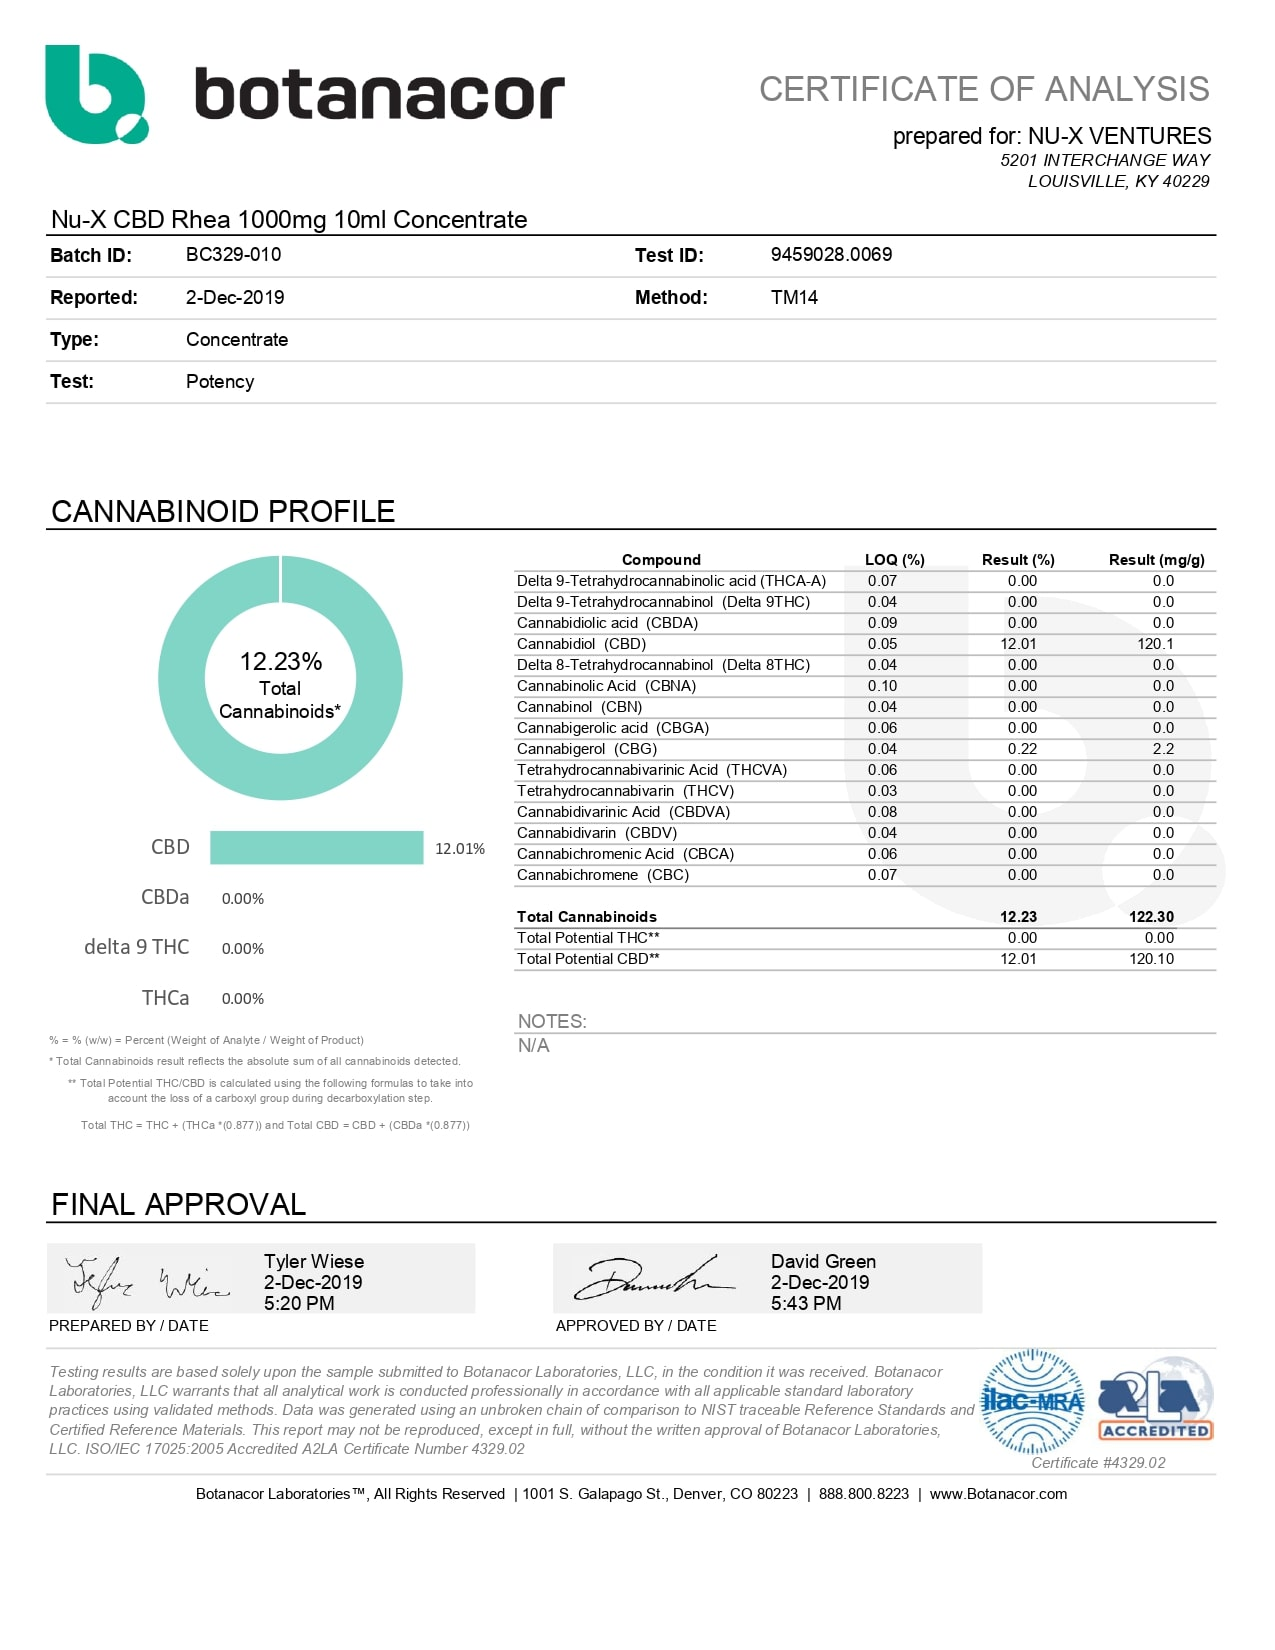 NU-X CBD eLiquid Concentrate Lab Report | Fruity - Rhea 1000mg